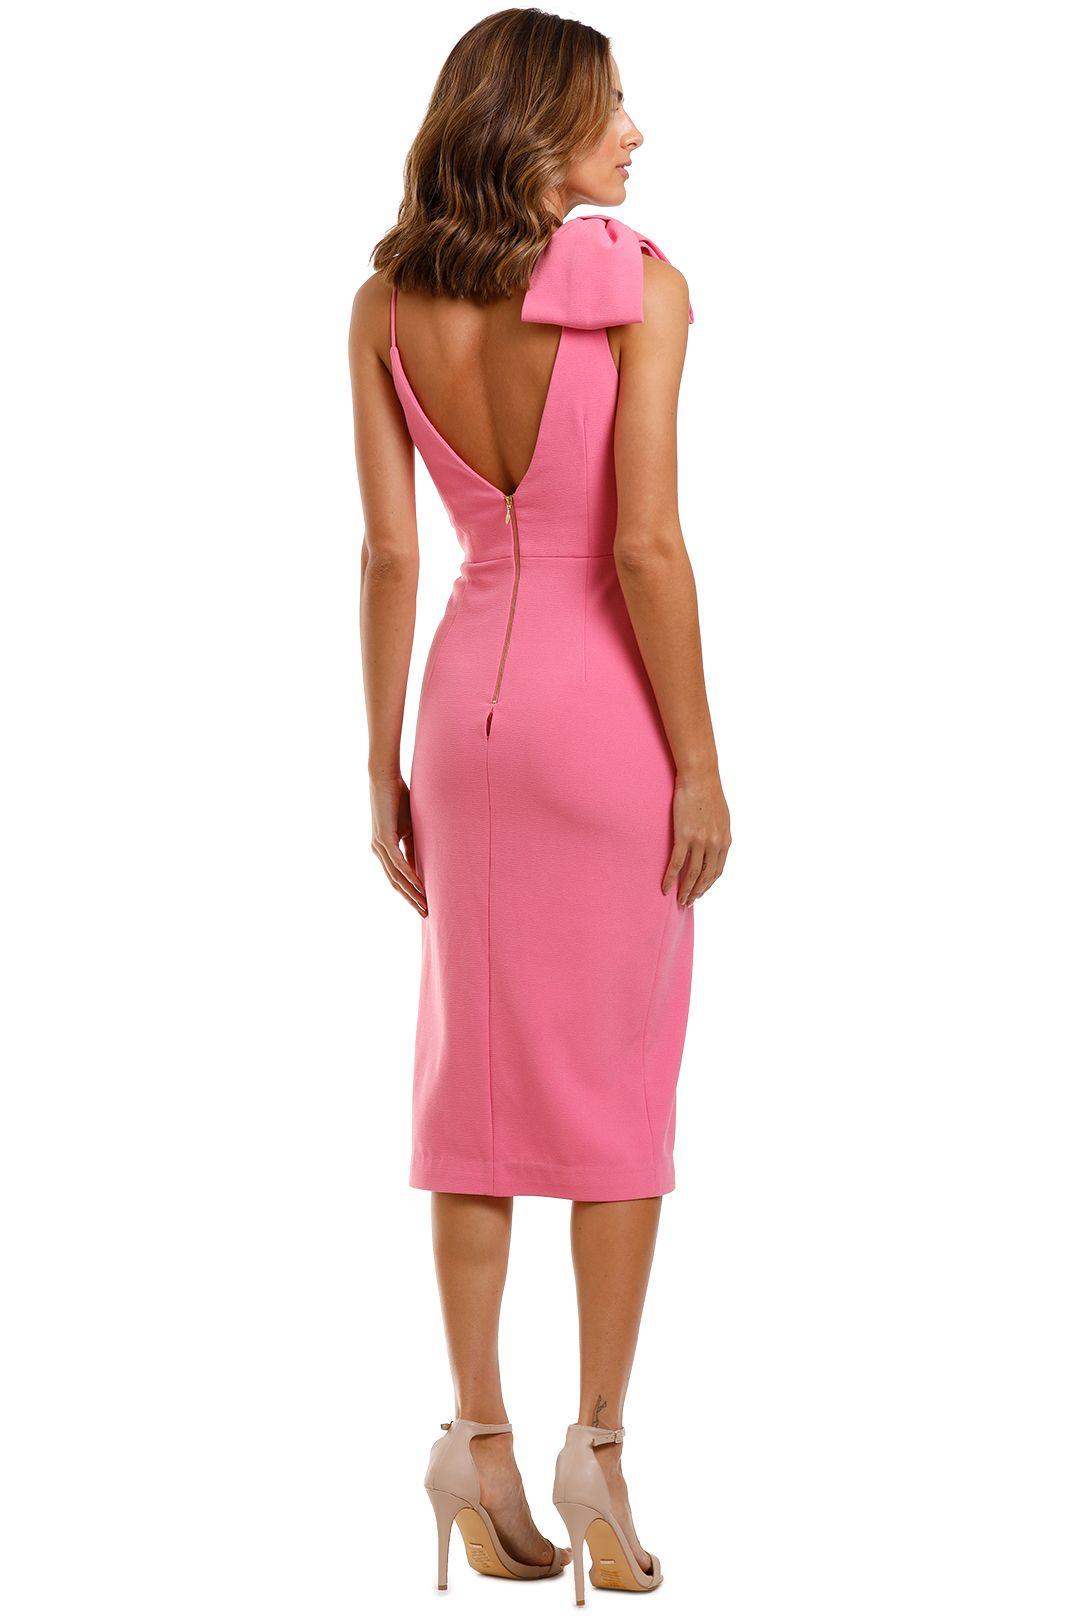 Rebecca Vallance Love Bow Dress Pink V Neck